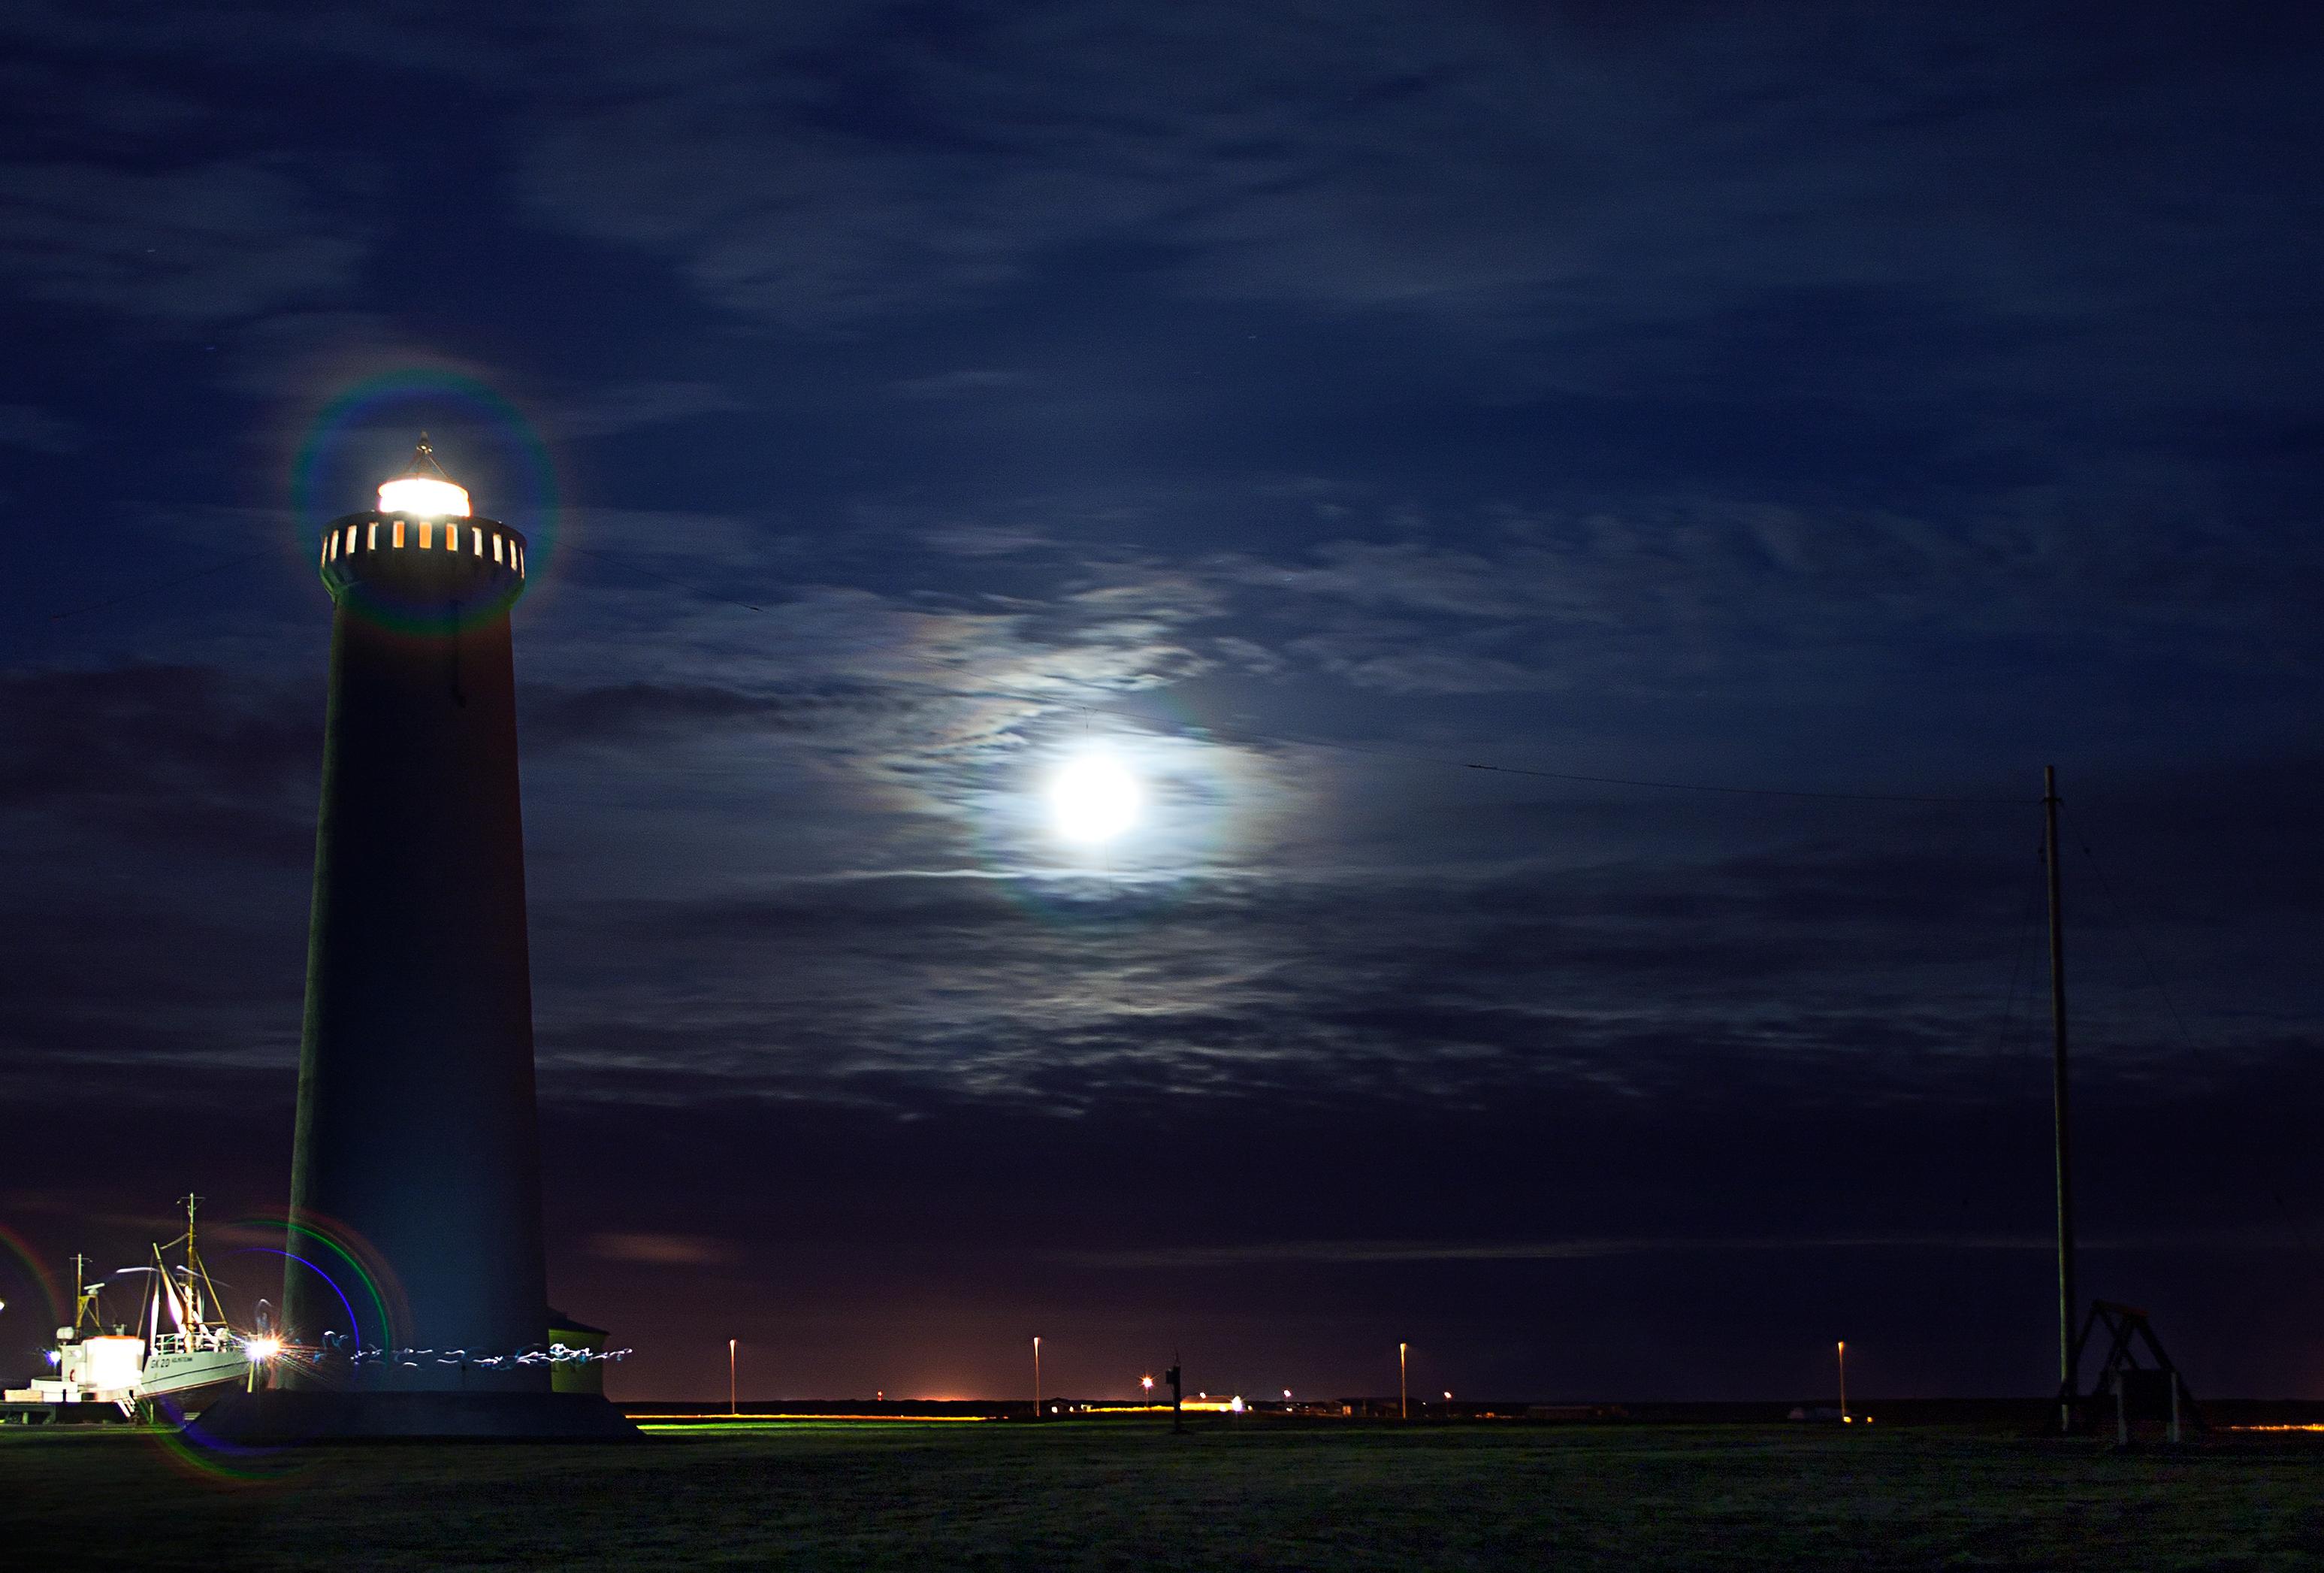 картинки ночного маяка заметили аэропорту турина